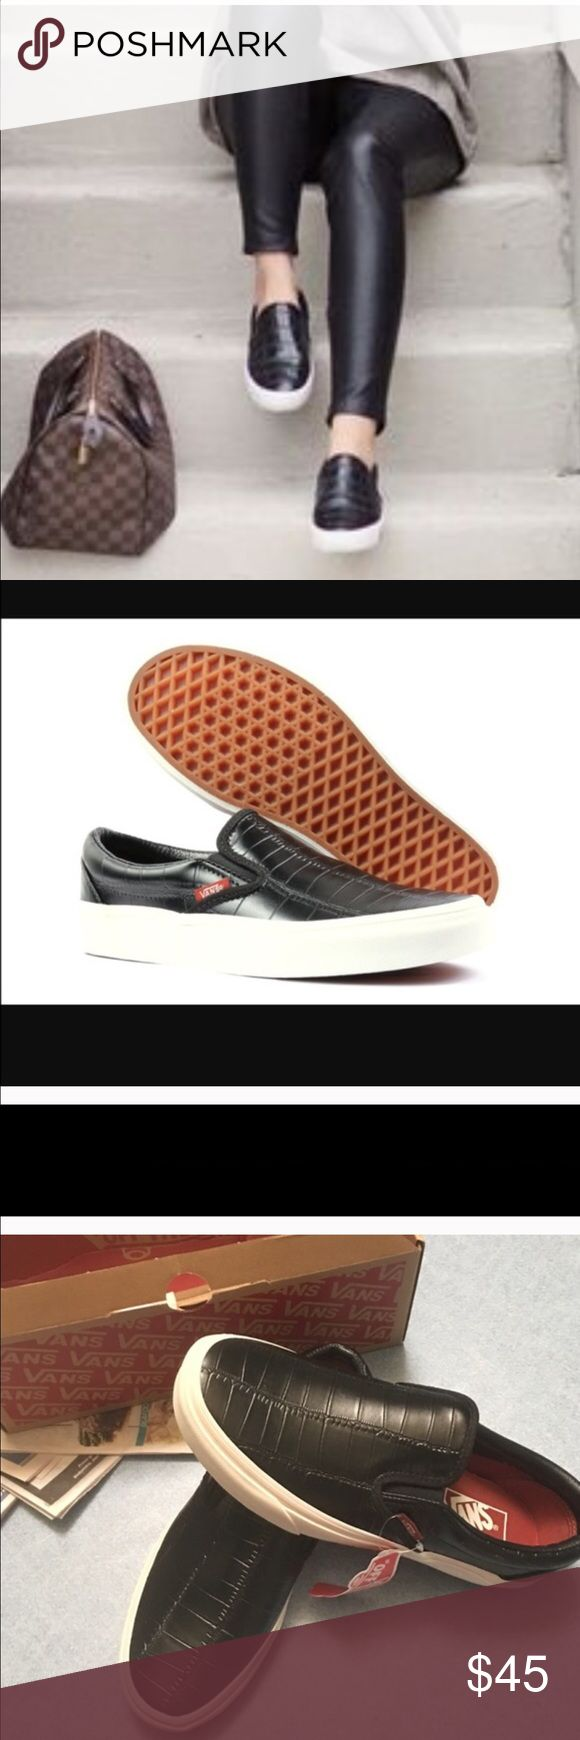 Vans leather shoes Brand new Vans Shoes